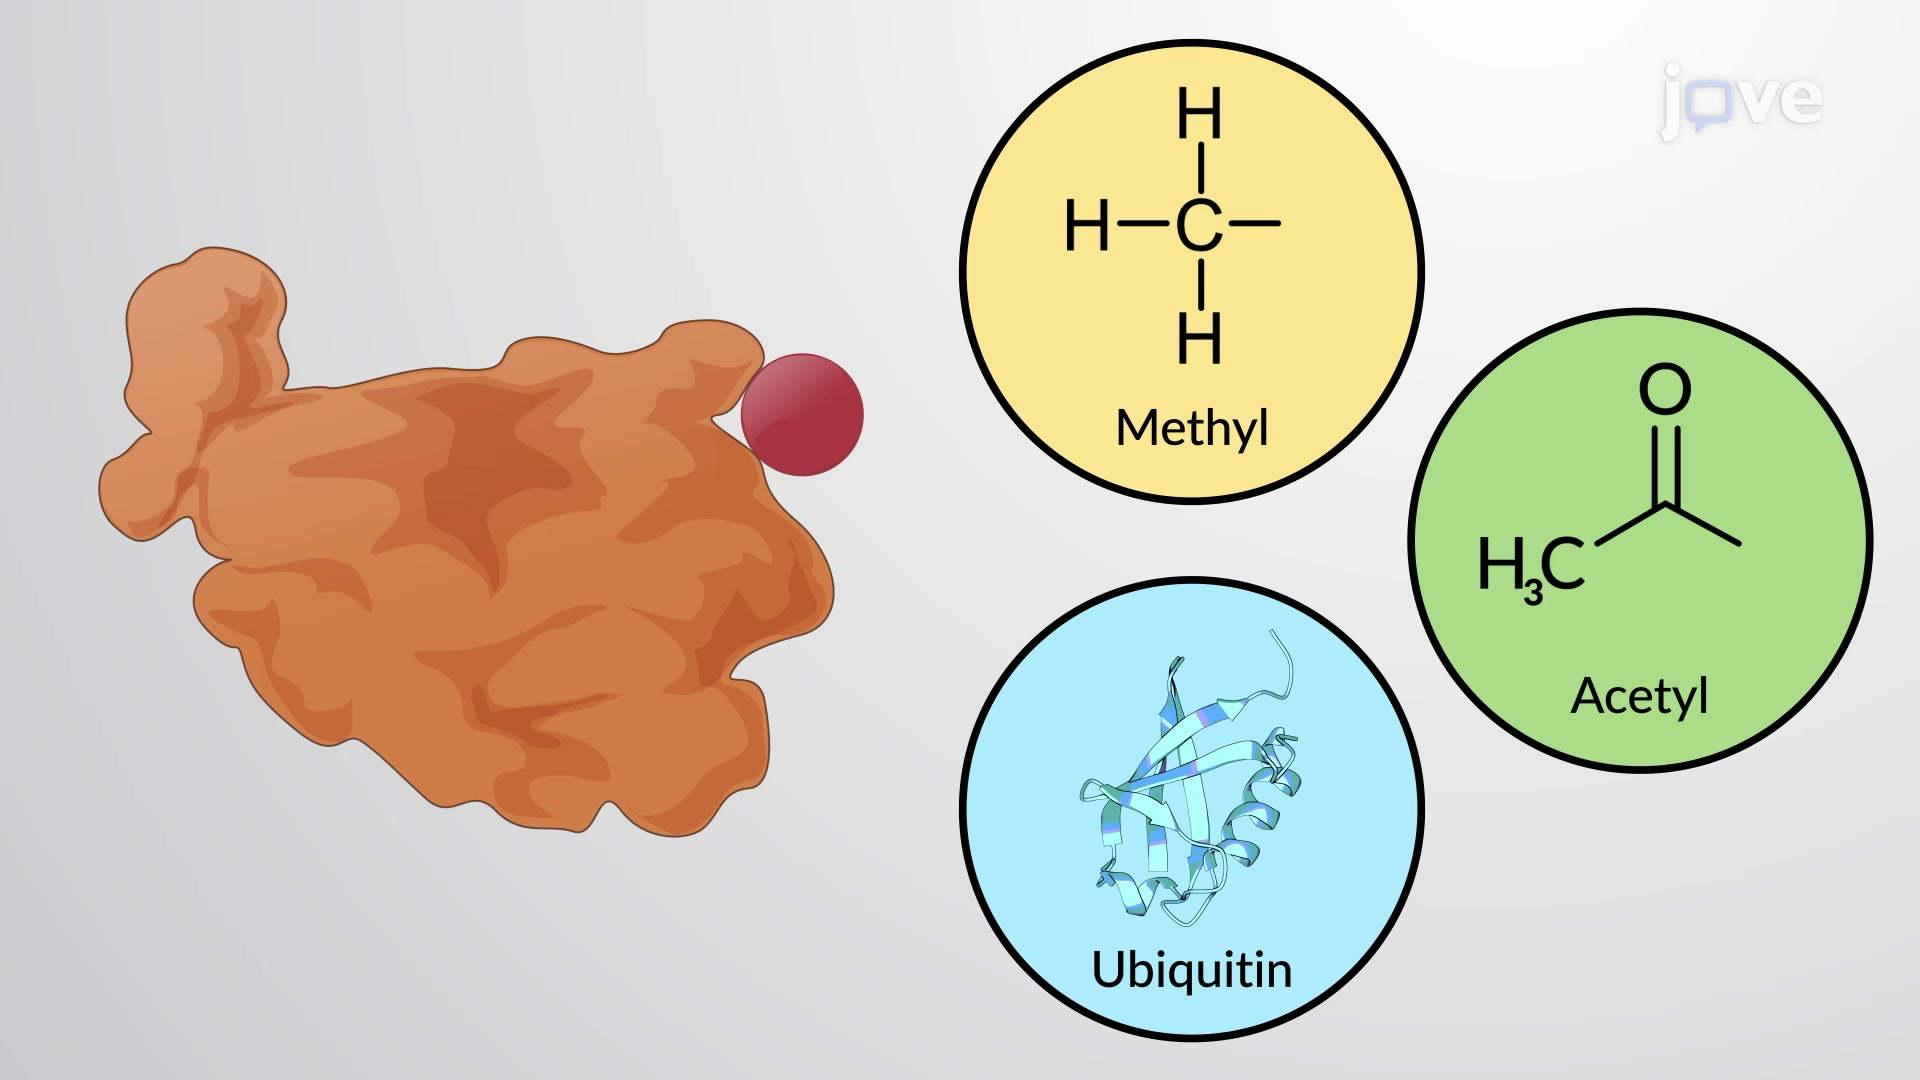 Regolatori di proteine covalentemente legate